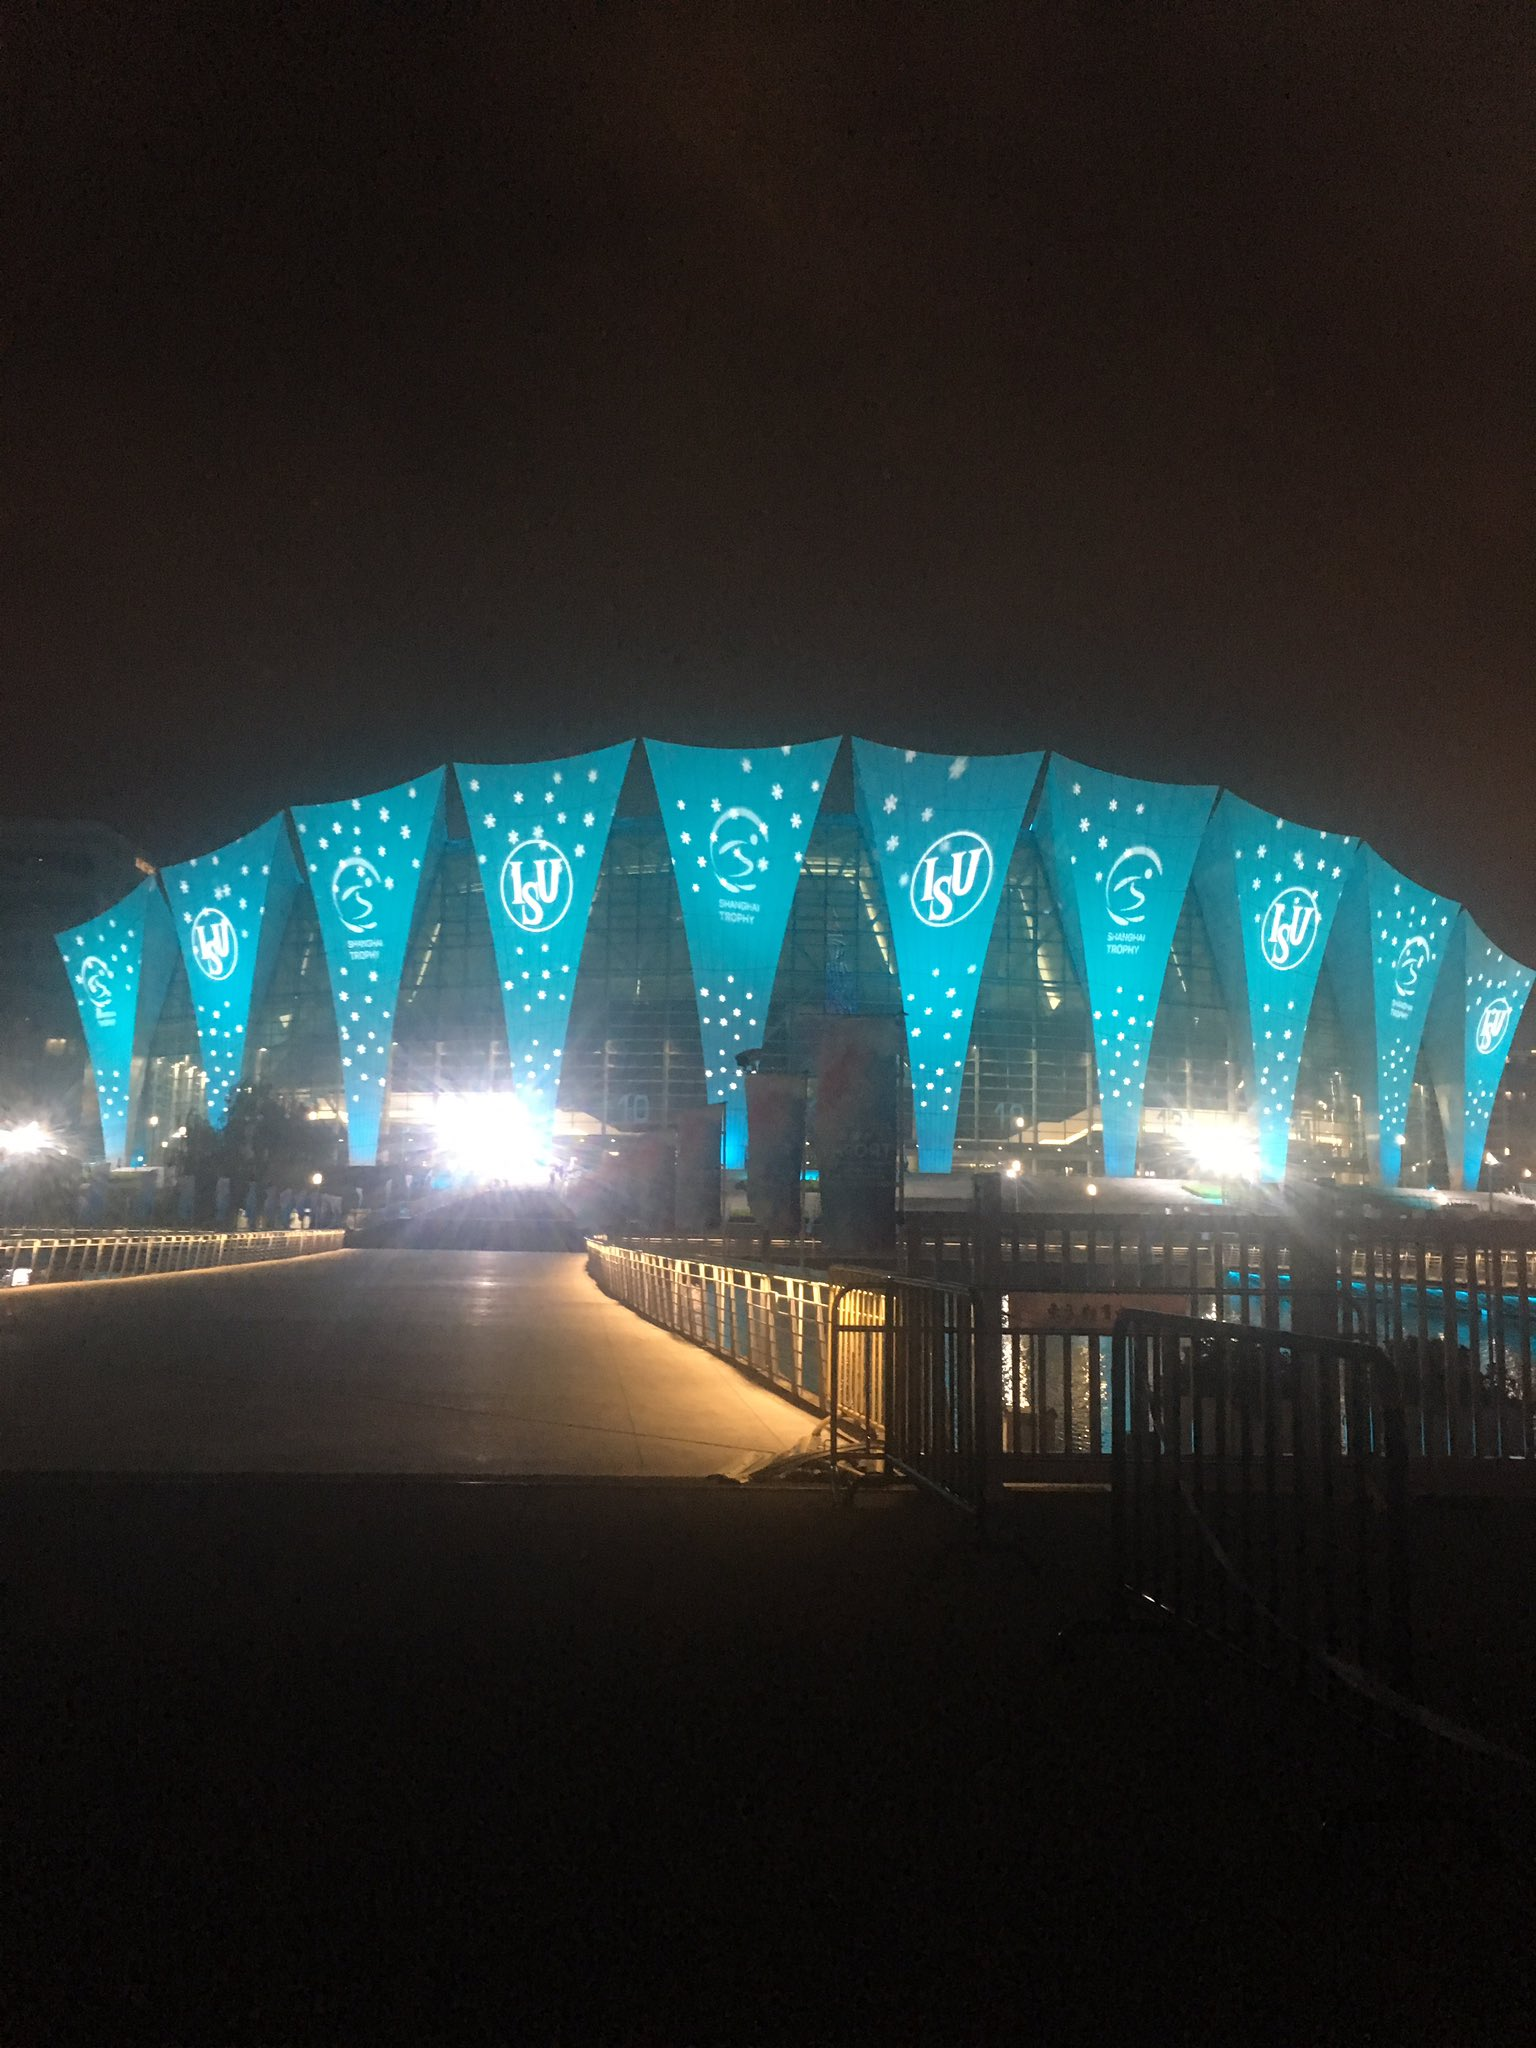 Shanghai Trophy (Invitational). 3-5 октября 2019. Шанхай (Китай) - Страница 7 EGHDoNrUEAAb-lz?format=jpg&name=4096x4096